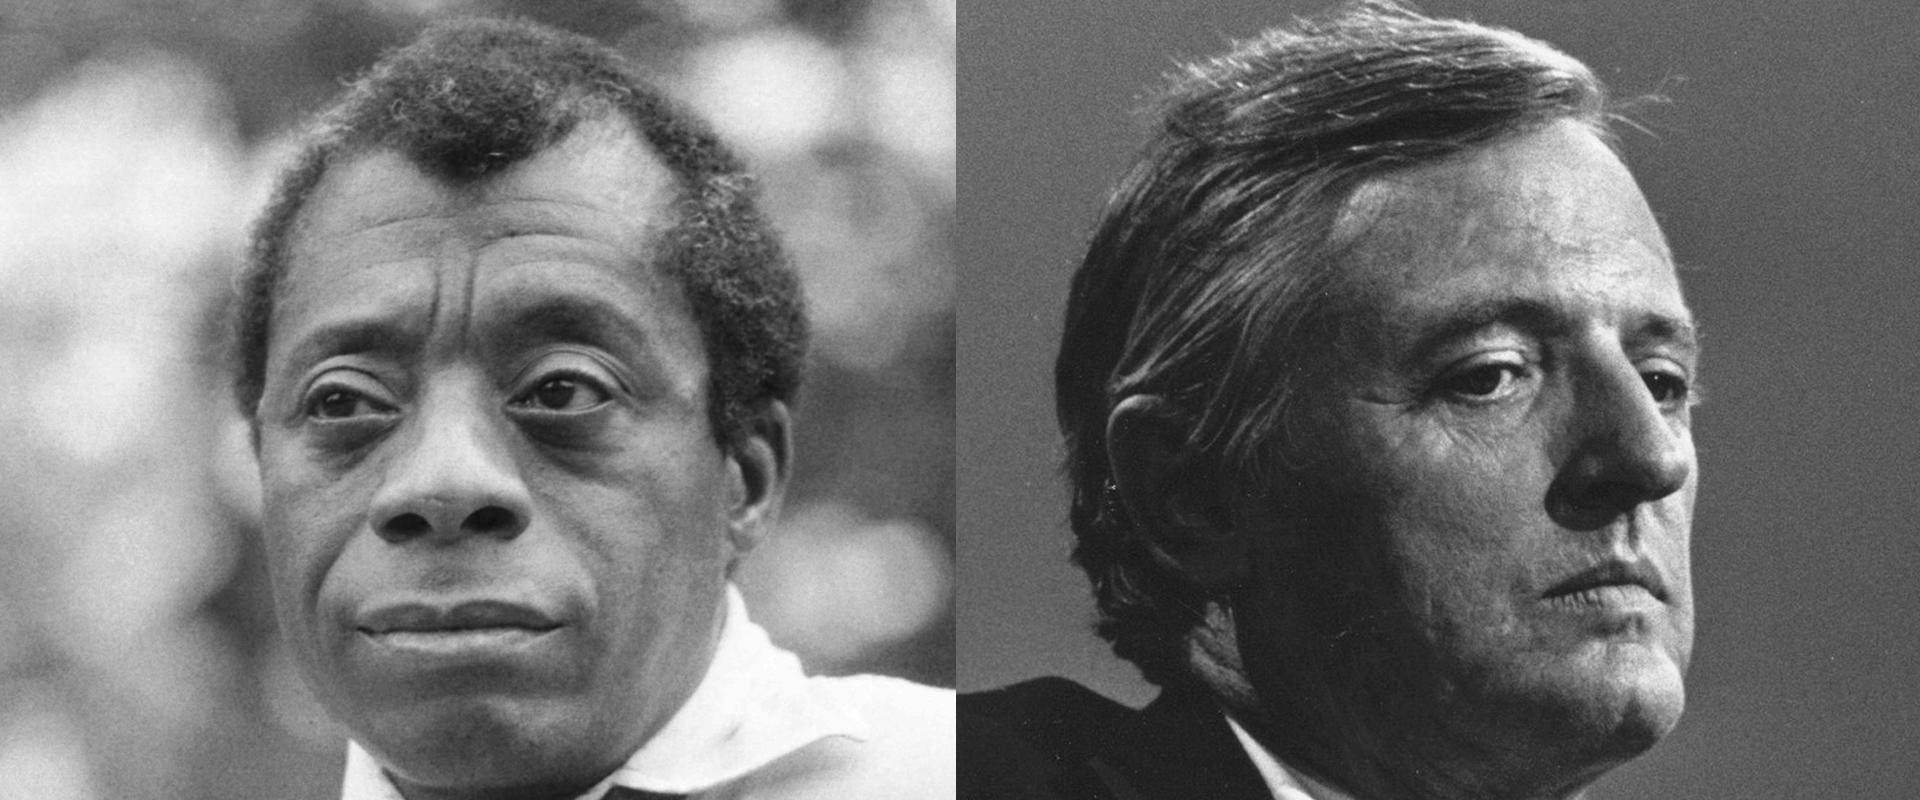 Baldwin and Buckley